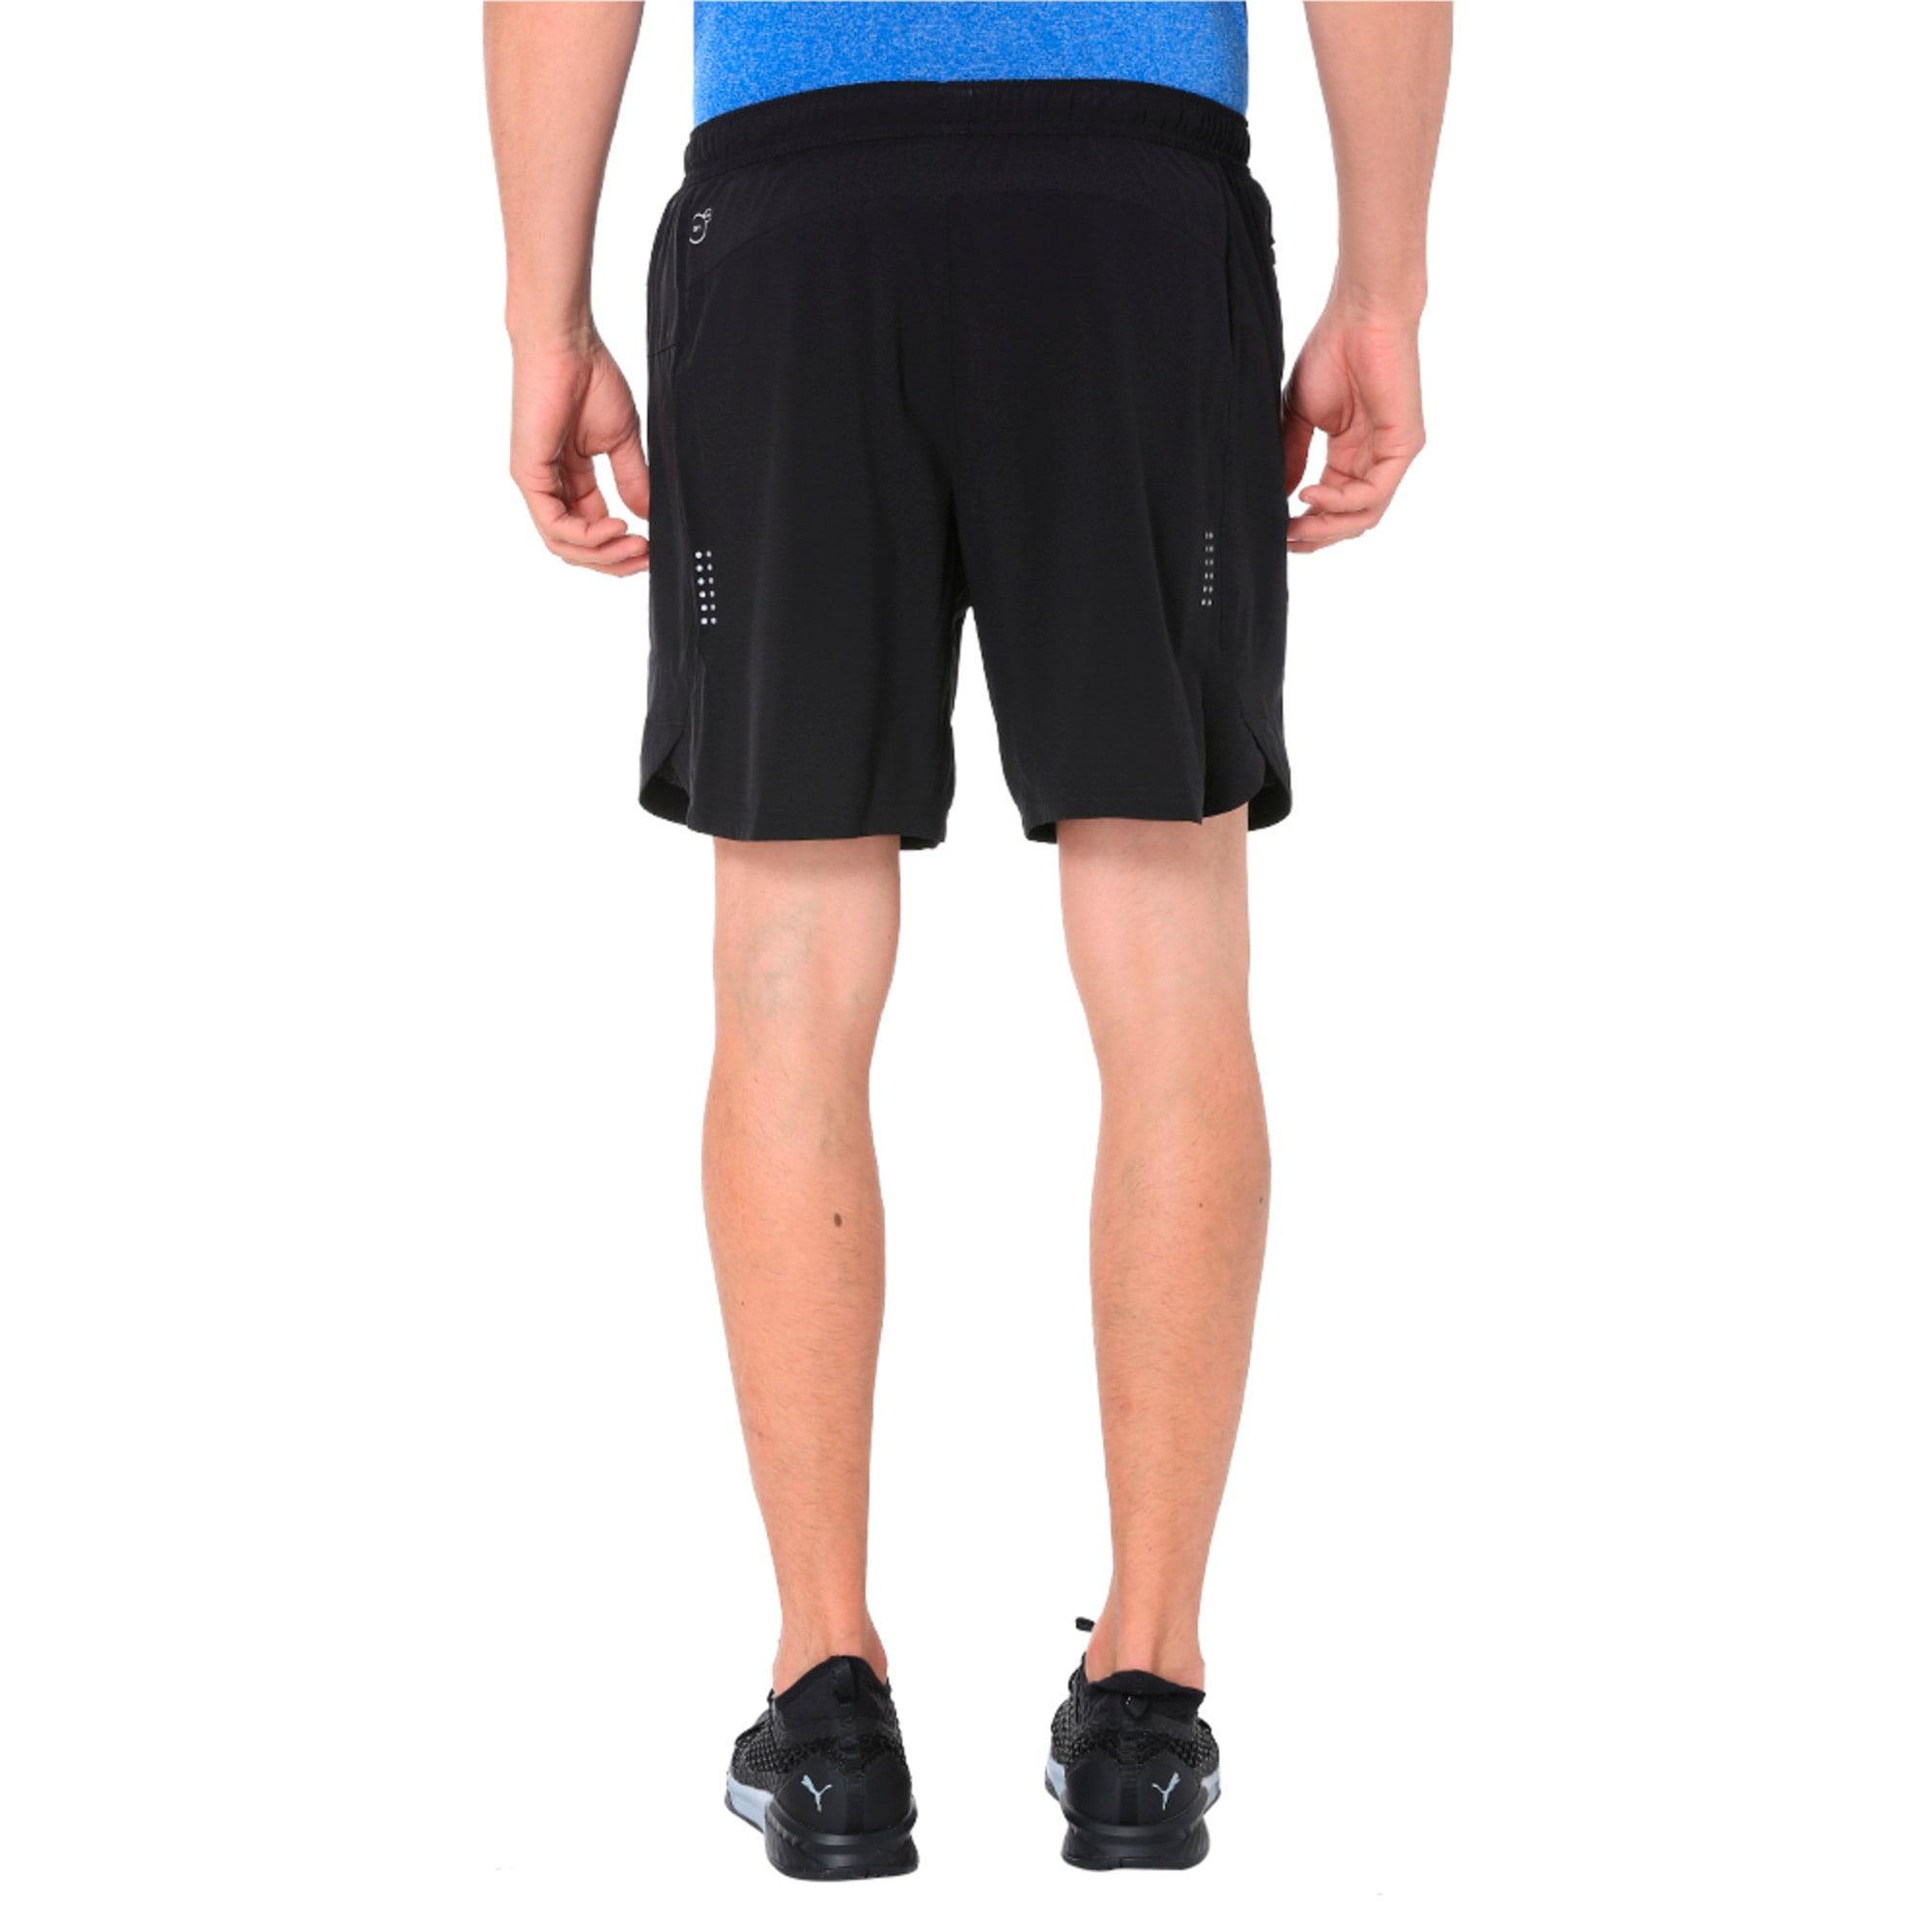 Thumbnail 4 of Pace 7'' Men's Running Shorts, Puma Black, medium-IND